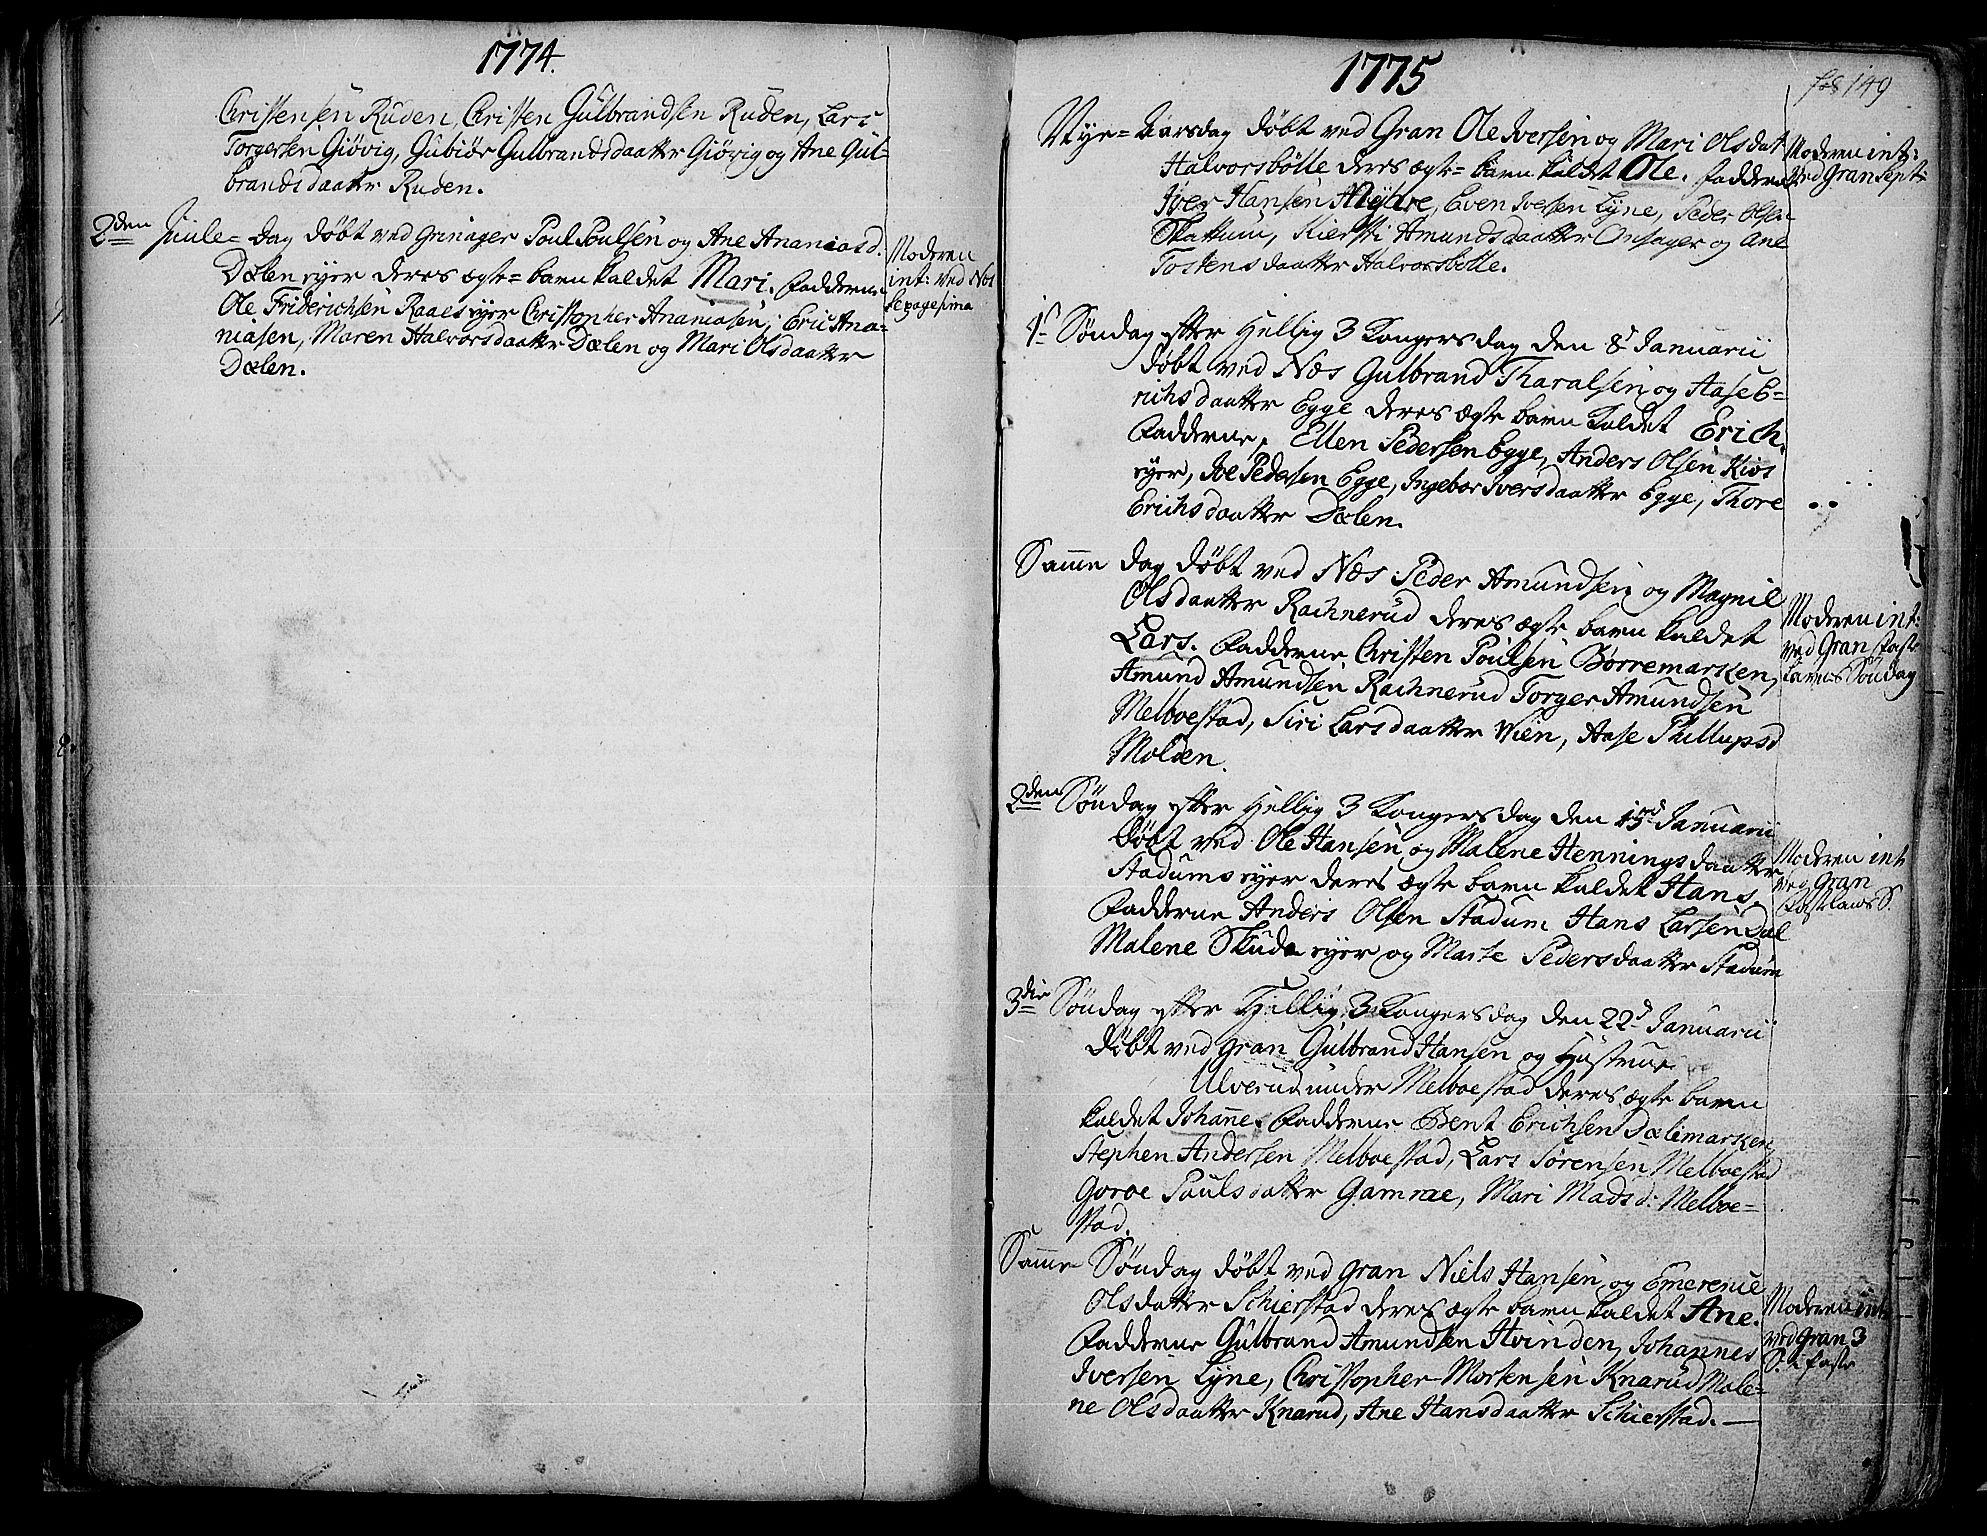 SAH, Gran prestekontor, Ministerialbok nr. 4, 1759-1775, s. 149